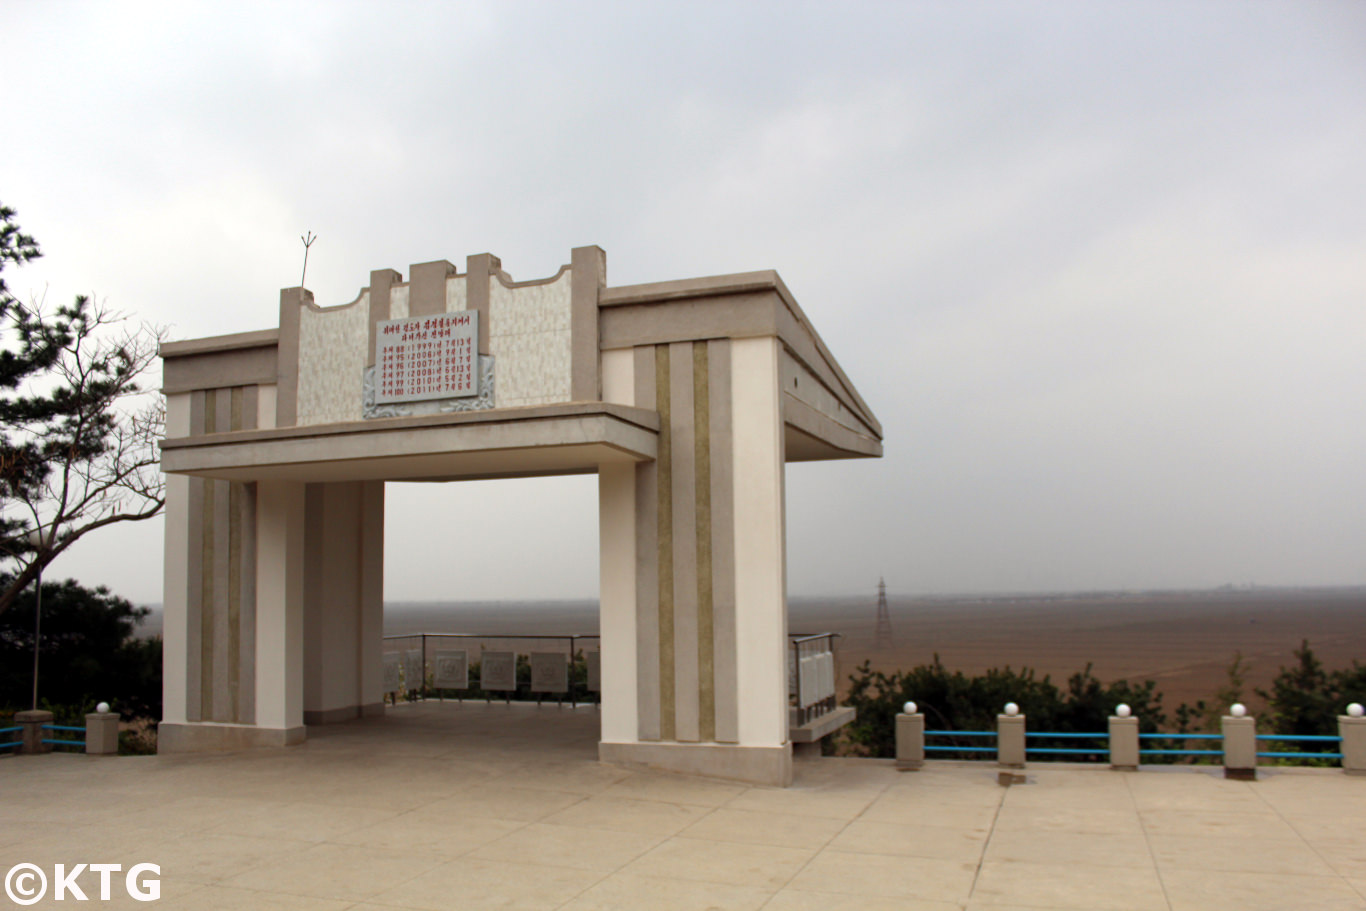 Sinuiju cosmetics factory, North Korea, with KTG Tours